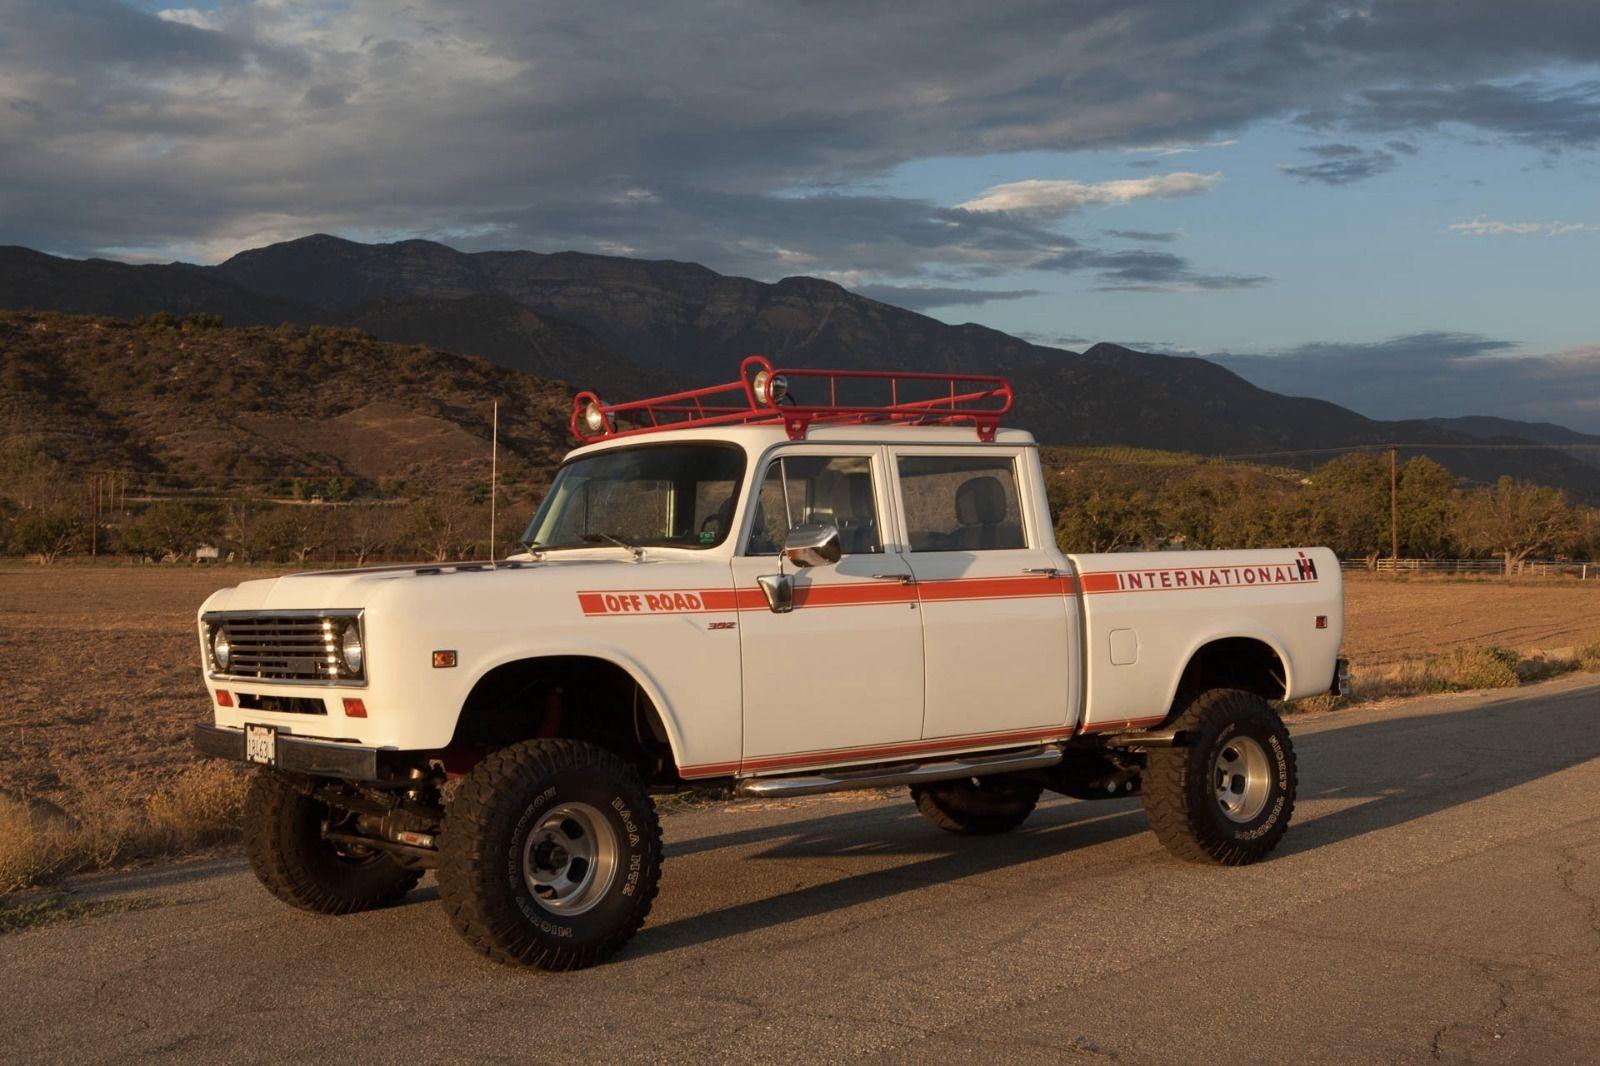 1973 international 4x4 crewcab restomod pickup truck for sale 4x4 friday. Black Bedroom Furniture Sets. Home Design Ideas